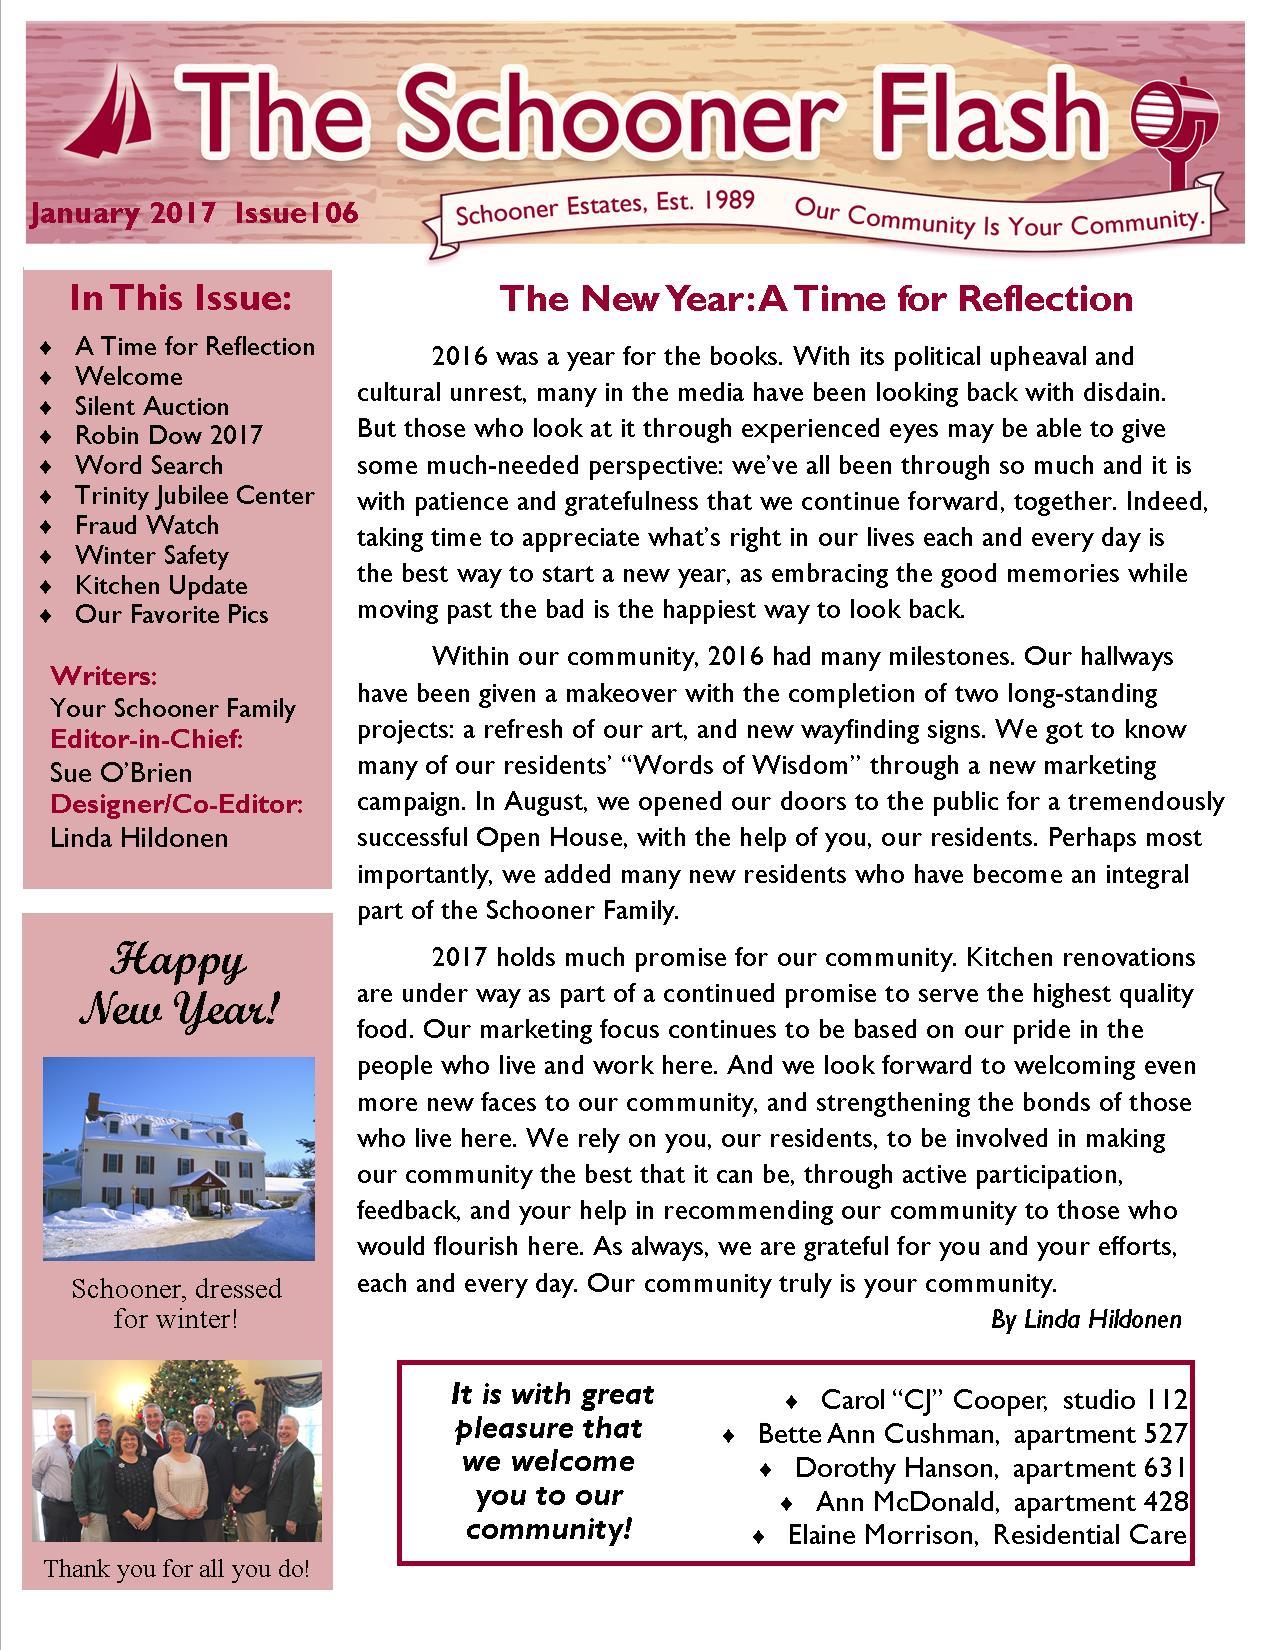 january-2017-flash-newsletter-1